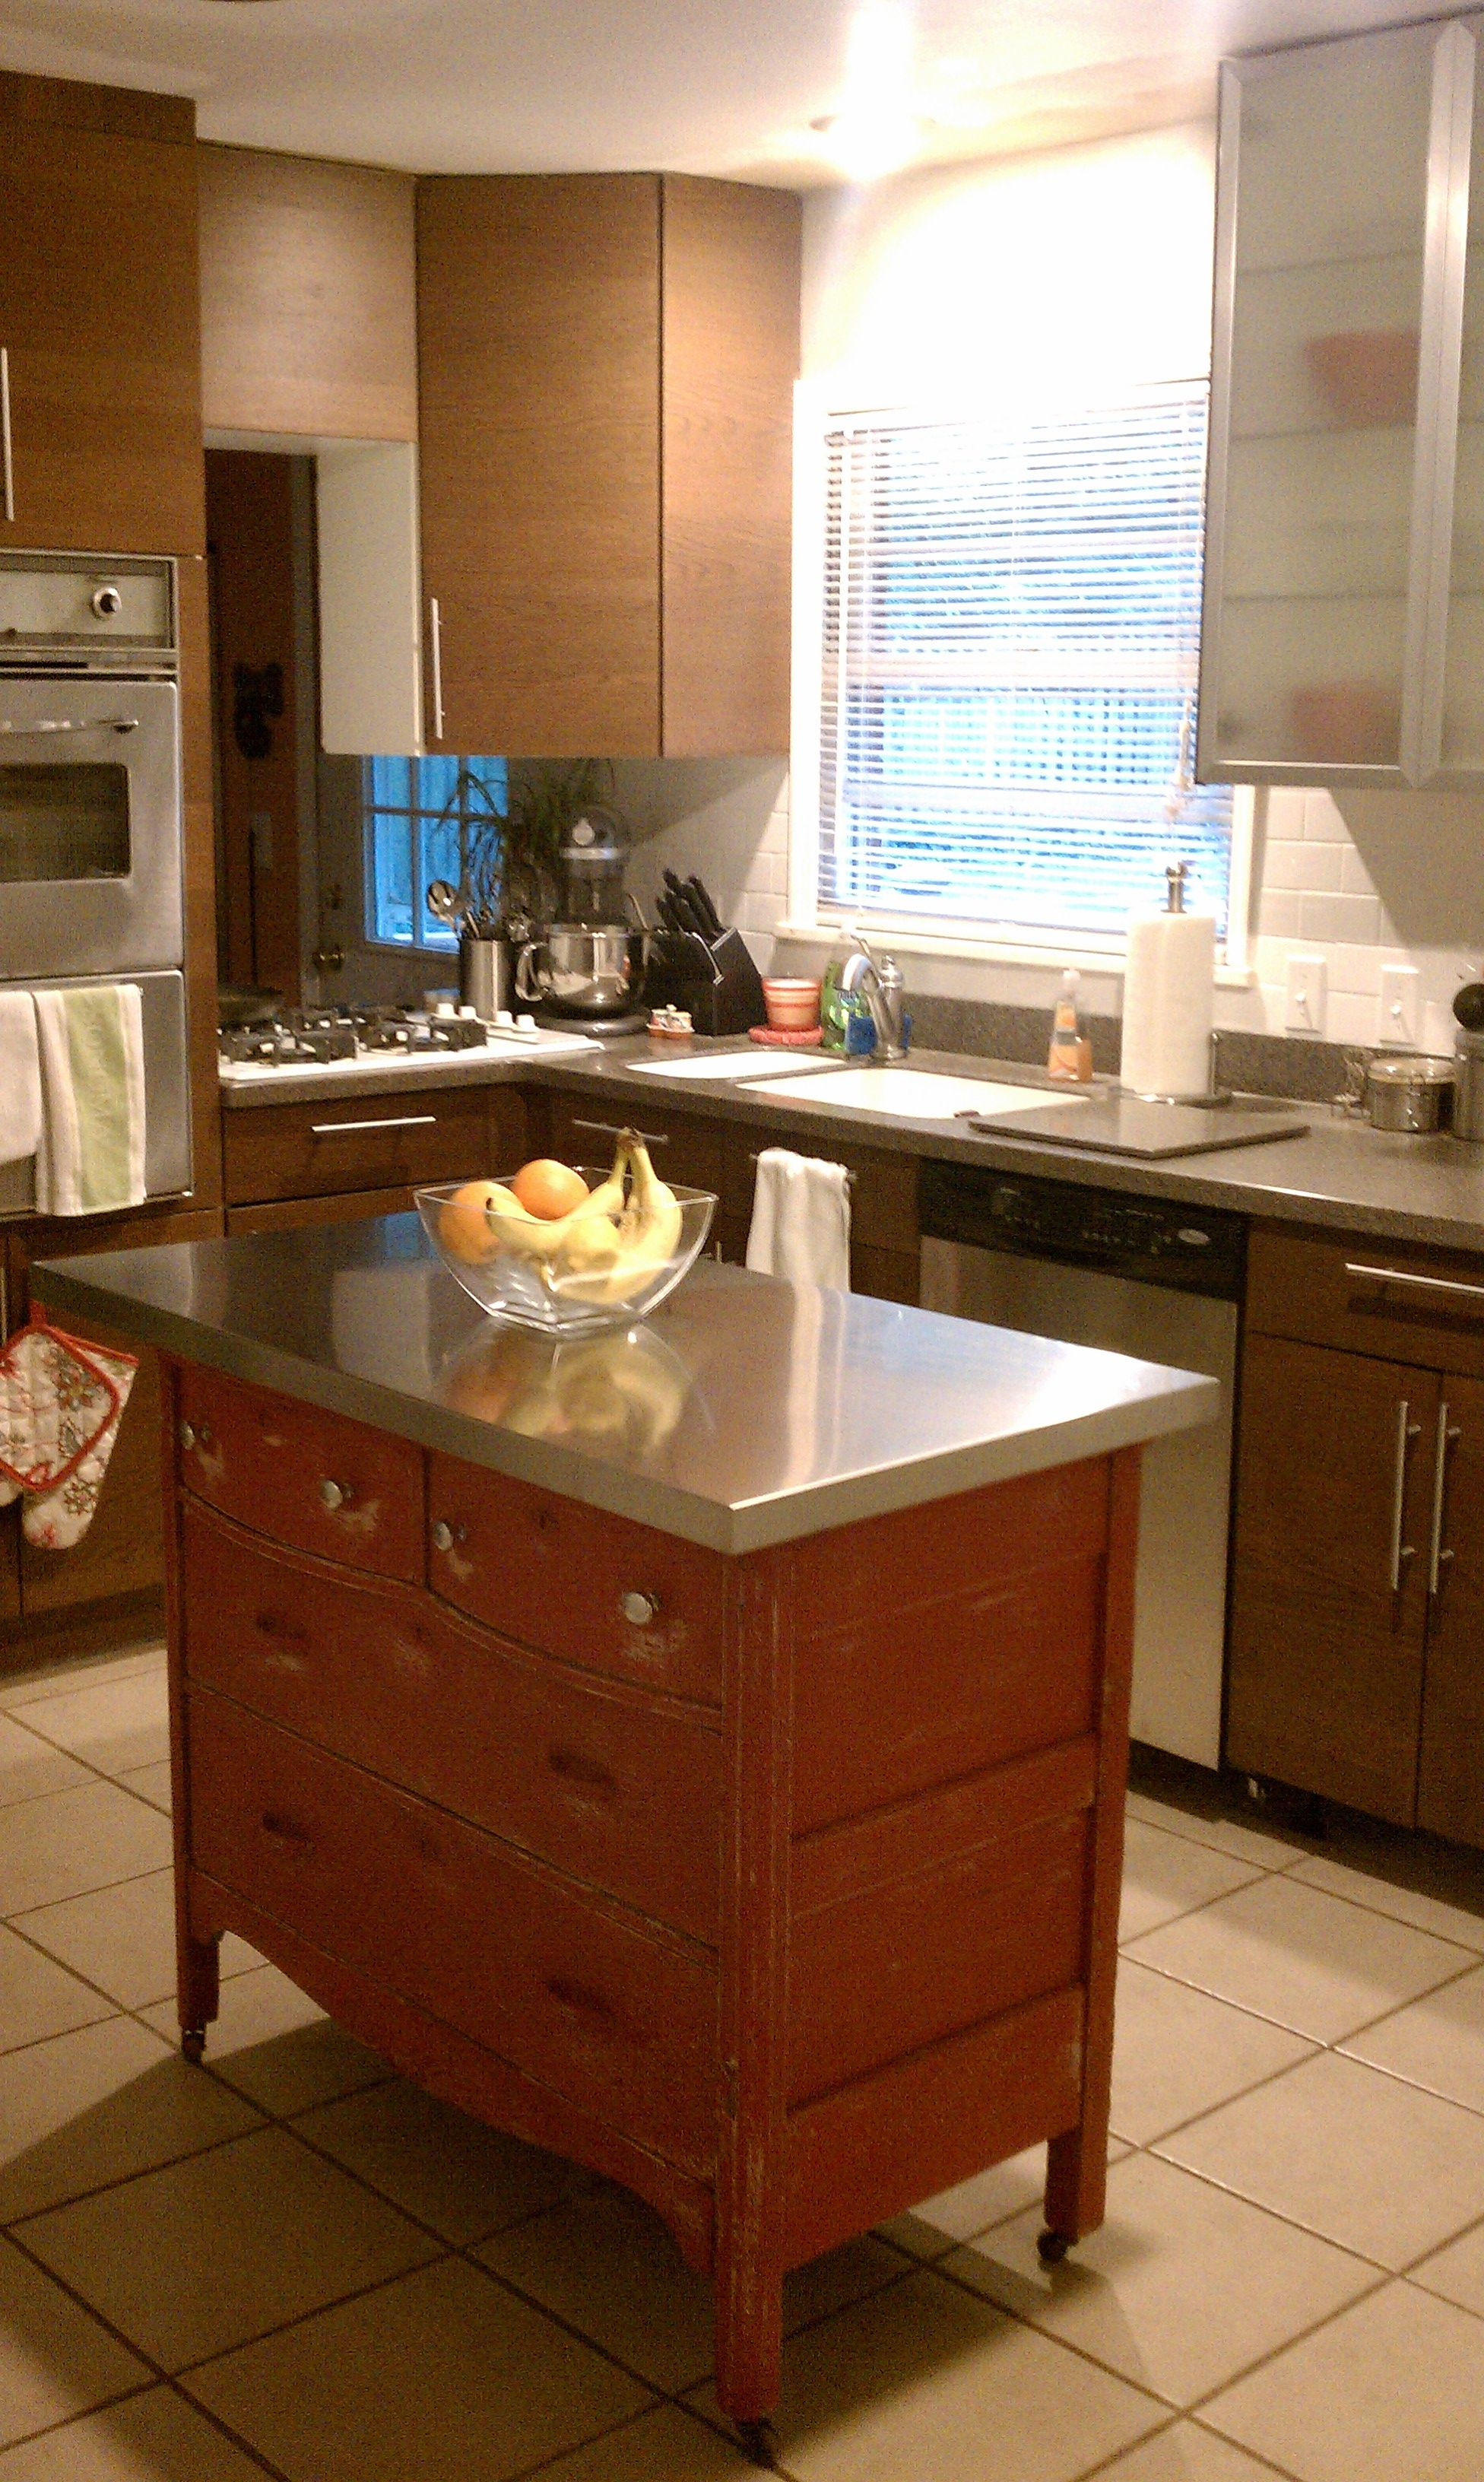 Dresser Island With Ikea Stainless Steel Top Kitchen Tops Kitchen Kitchen Inspirations